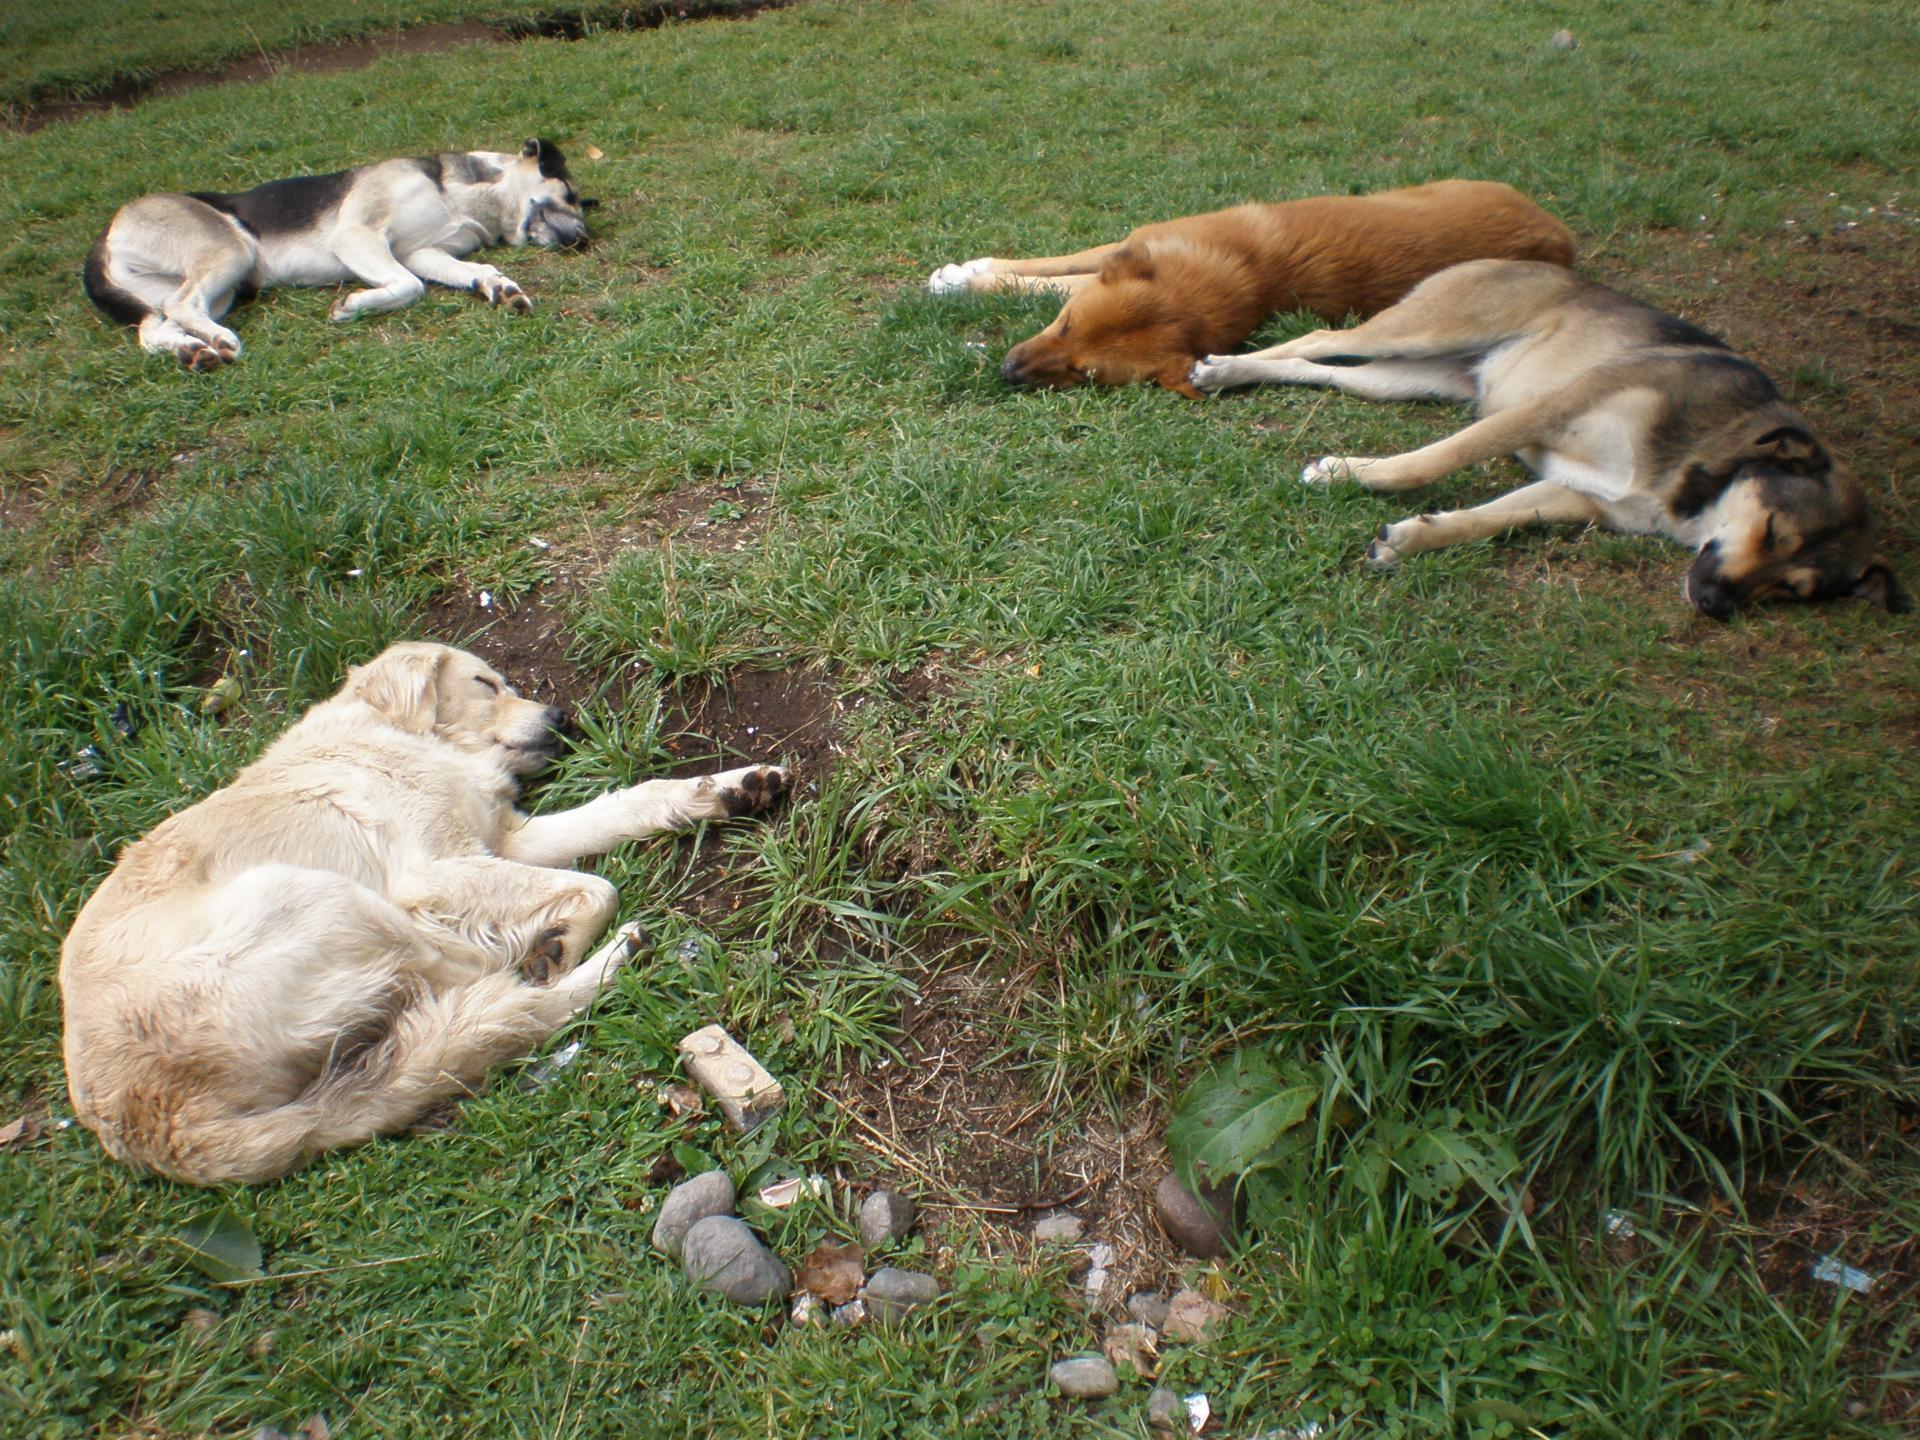 La nonchalence des chiens latinos